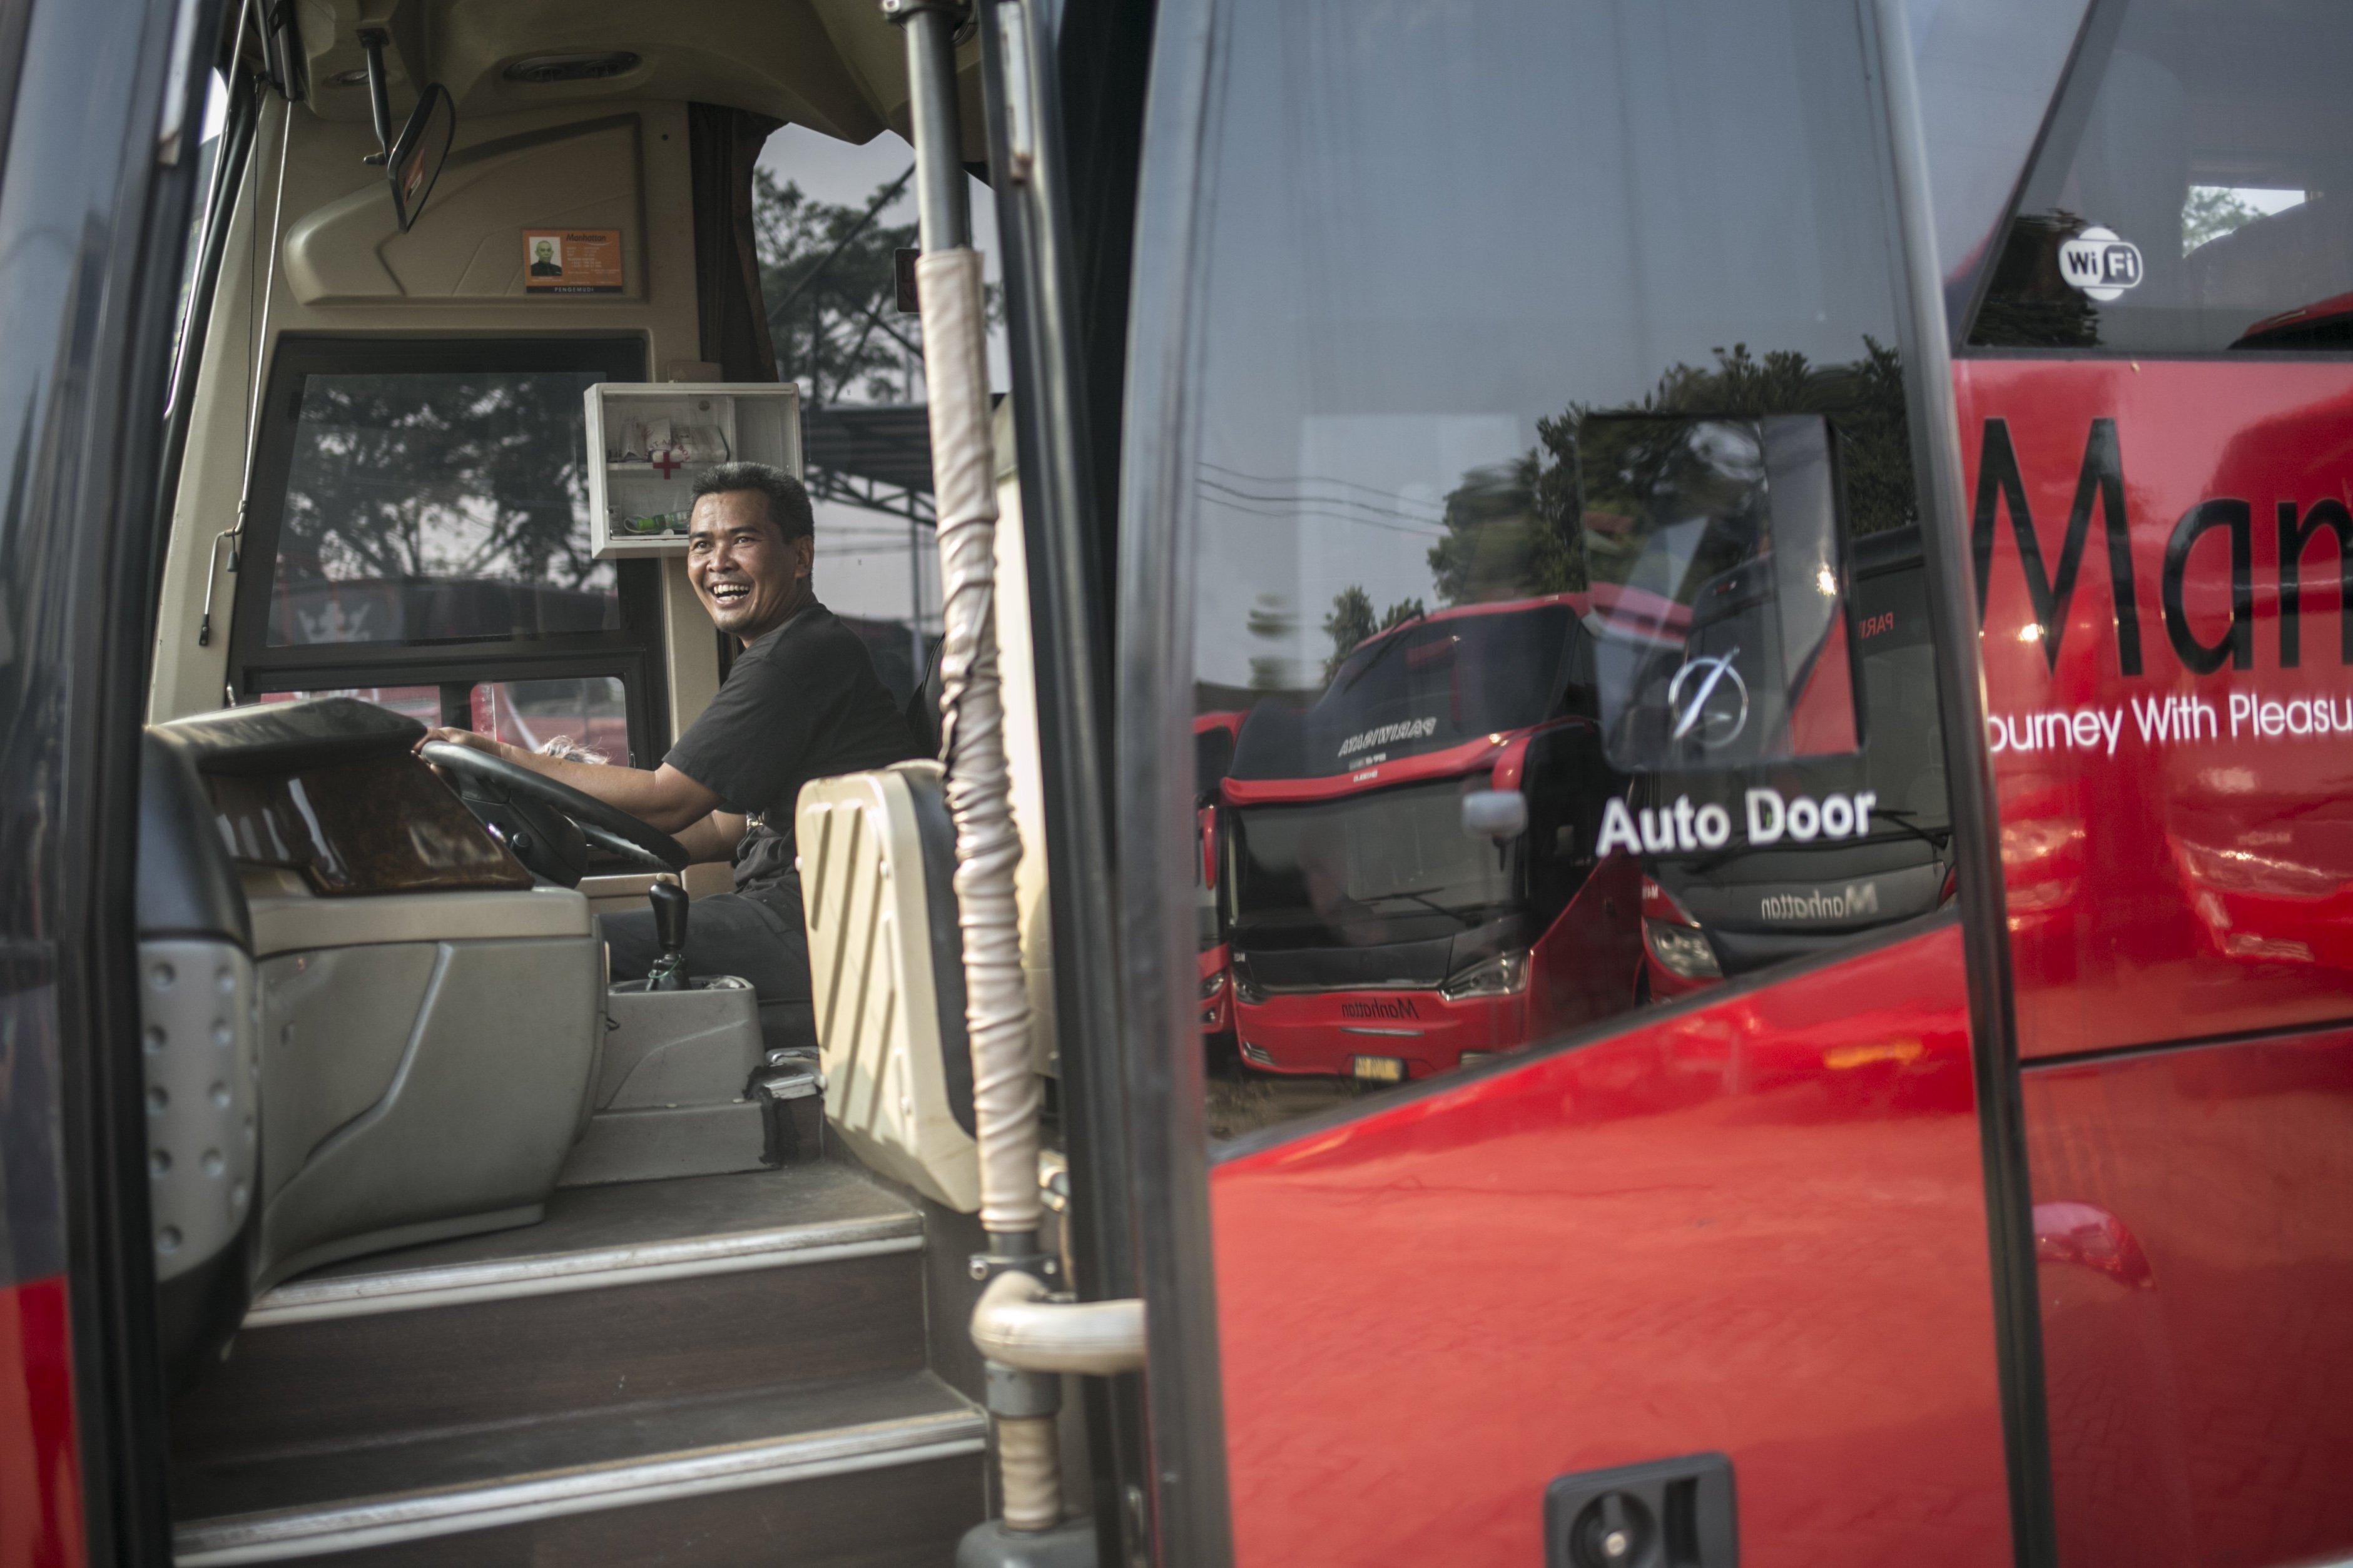 Mekanik memanaskan mesin bus di salah satu pool bus pariwisata di kawasan Tanjung Barat, Jagakarsa, Jakarta, Selasa (28/7/2020). Masih diberlakukannya Pembatasan Sosial Bersekala Besar (PSBB) dan penutupan tempat rekreasi akibat Covid-19, berimbas pada jasa transportasi pariwisata. Sejak bulan Maret pengelola mengaku mengalami penurunan pendapatan dan penyewaan bus hingga 80%.